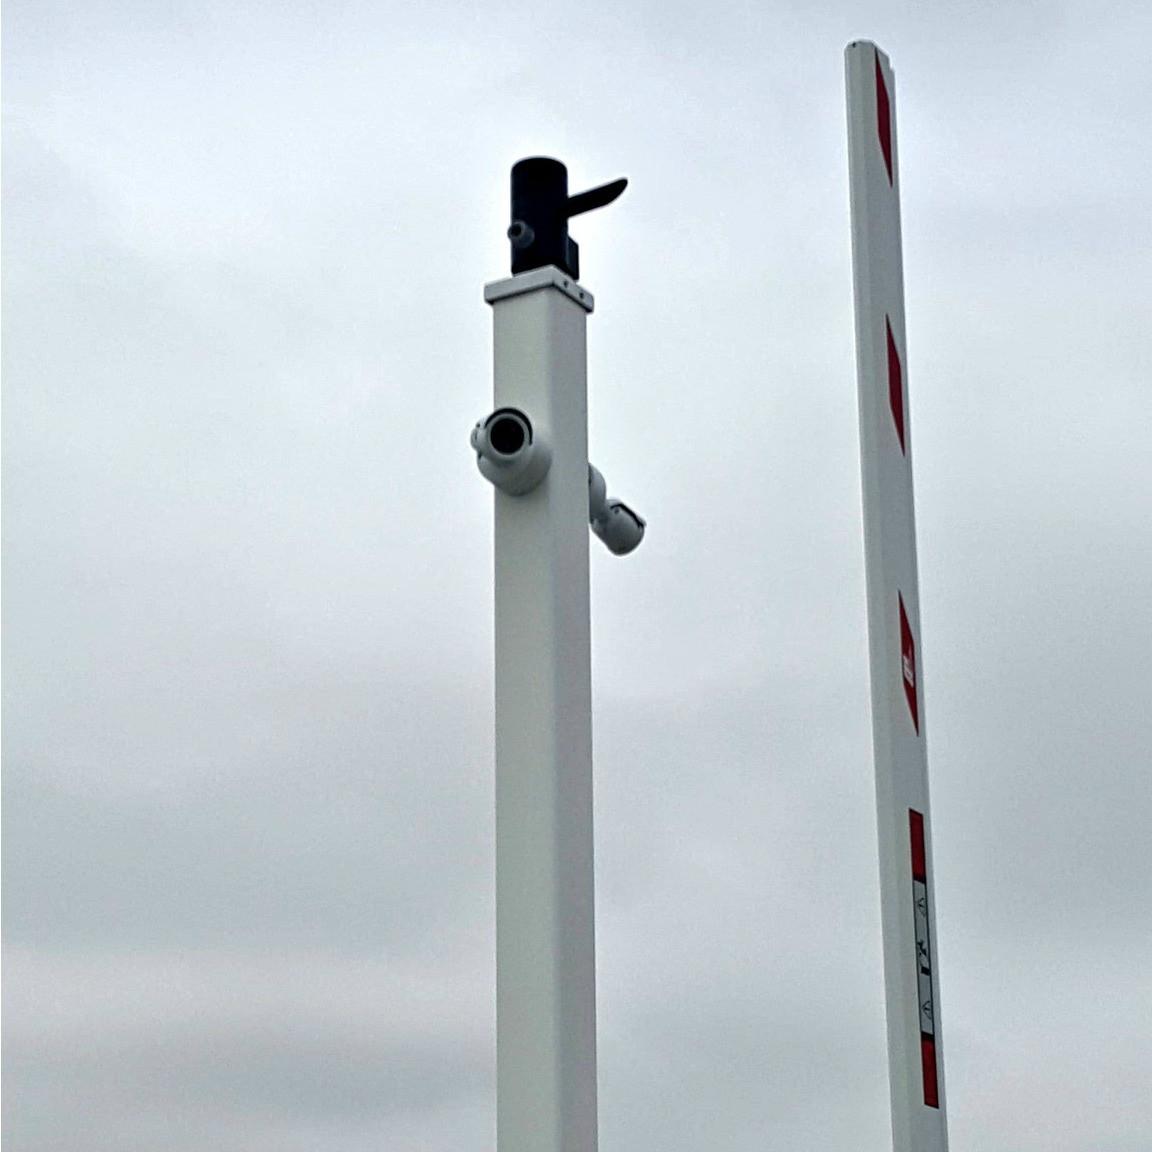 Light Poles Plus: #1416: Square Straight Aluminum Camera Pole Post